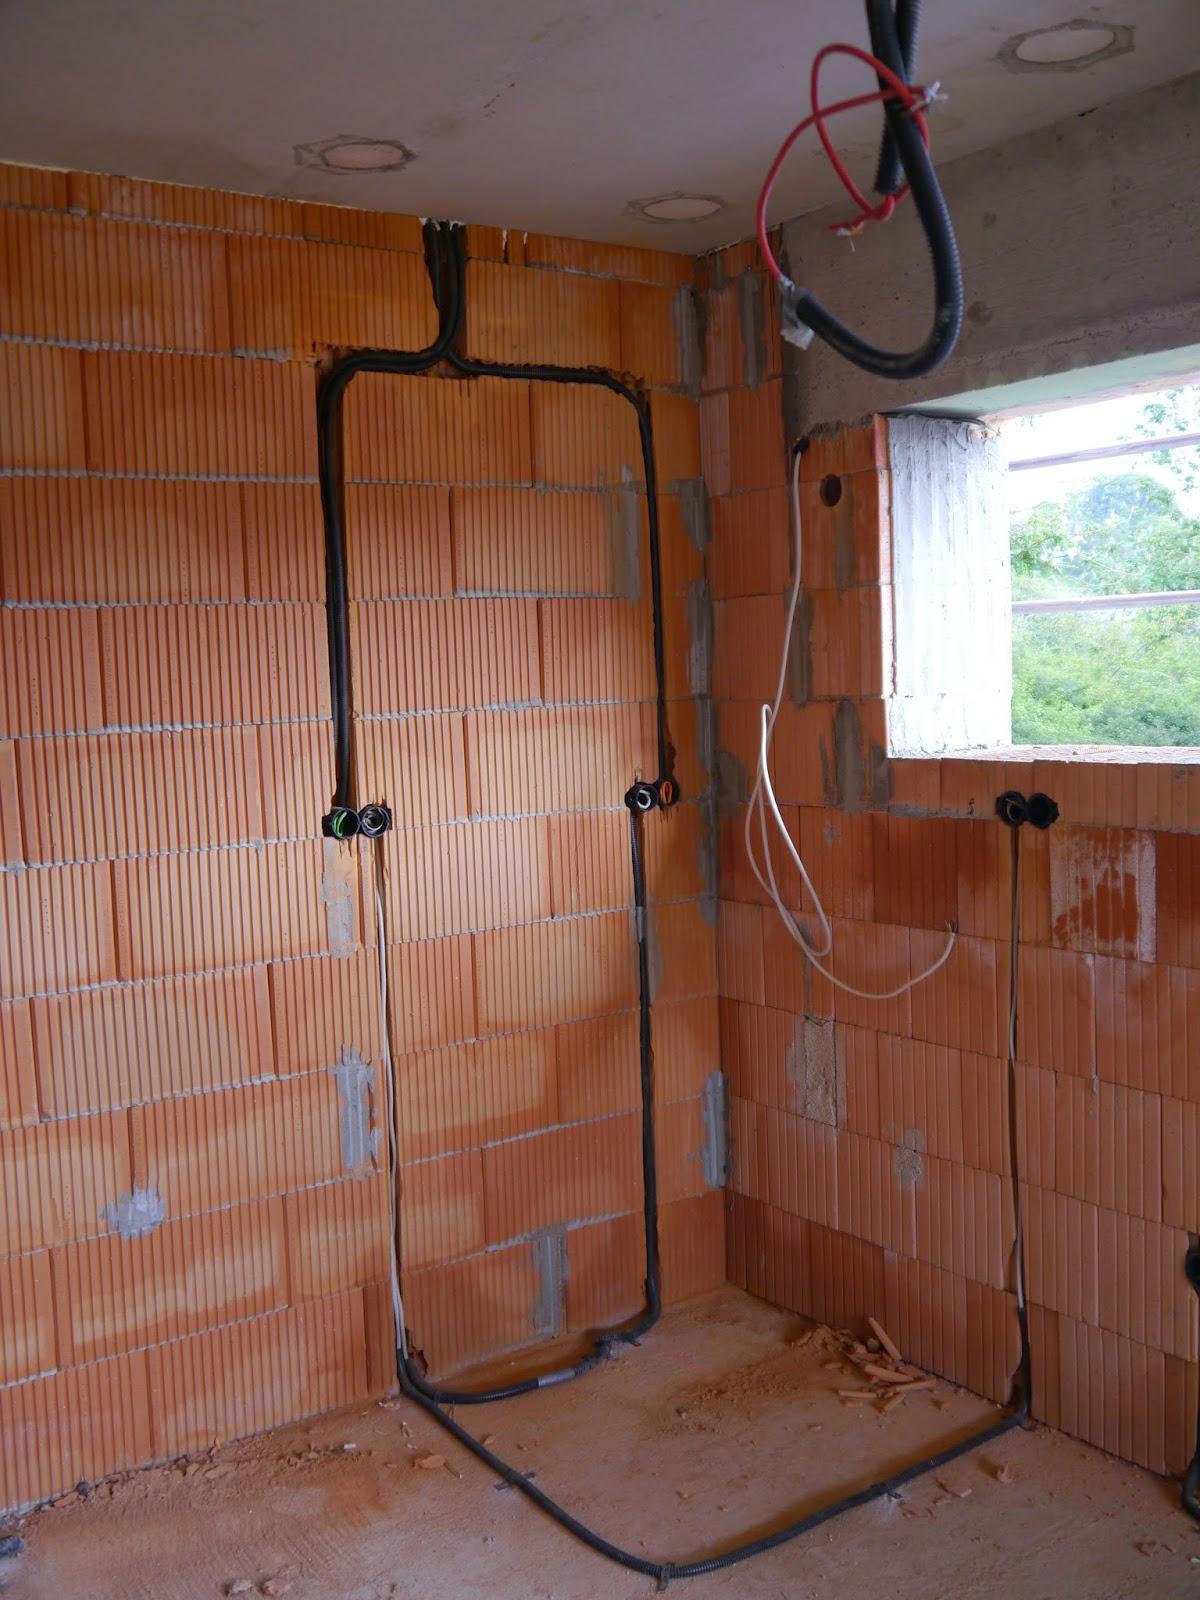 elektroinstallation k che anleitung installationsplan k che ikea k che sockelleiste montieren. Black Bedroom Furniture Sets. Home Design Ideas